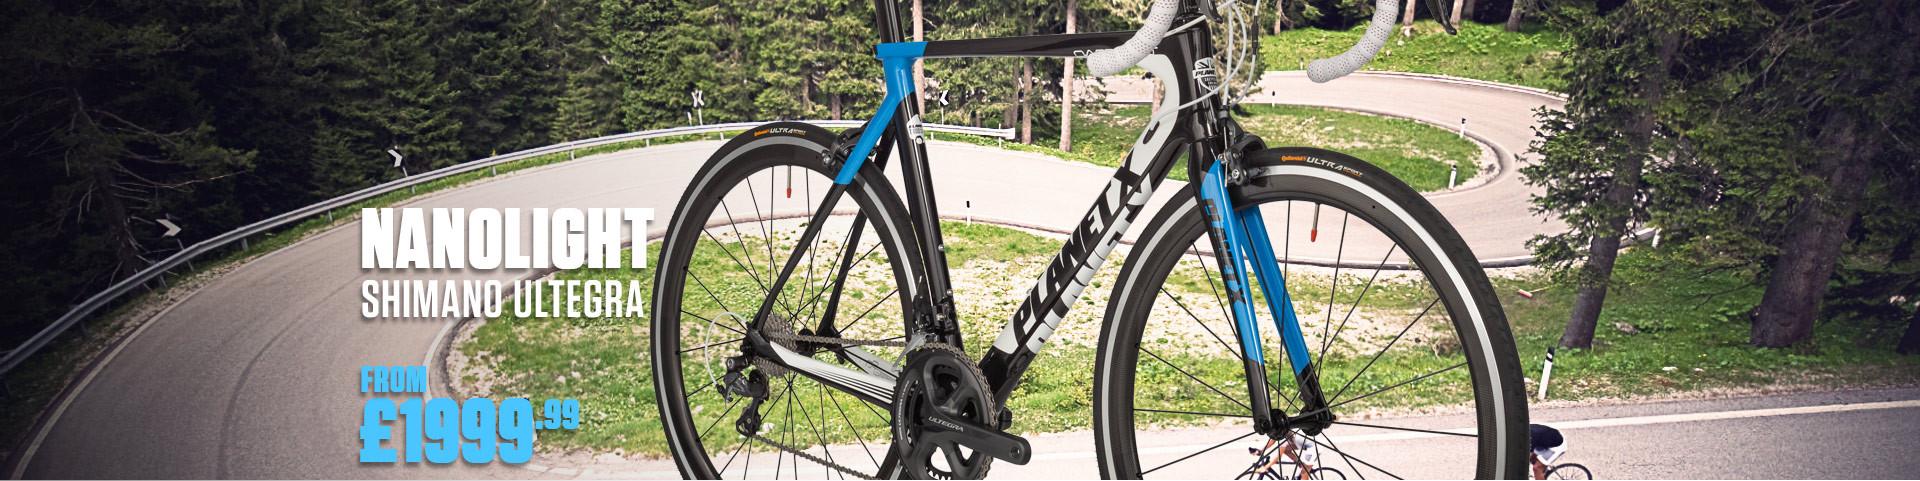 Planet X Nanolight Shimano Ultegra 6800 Road Bike